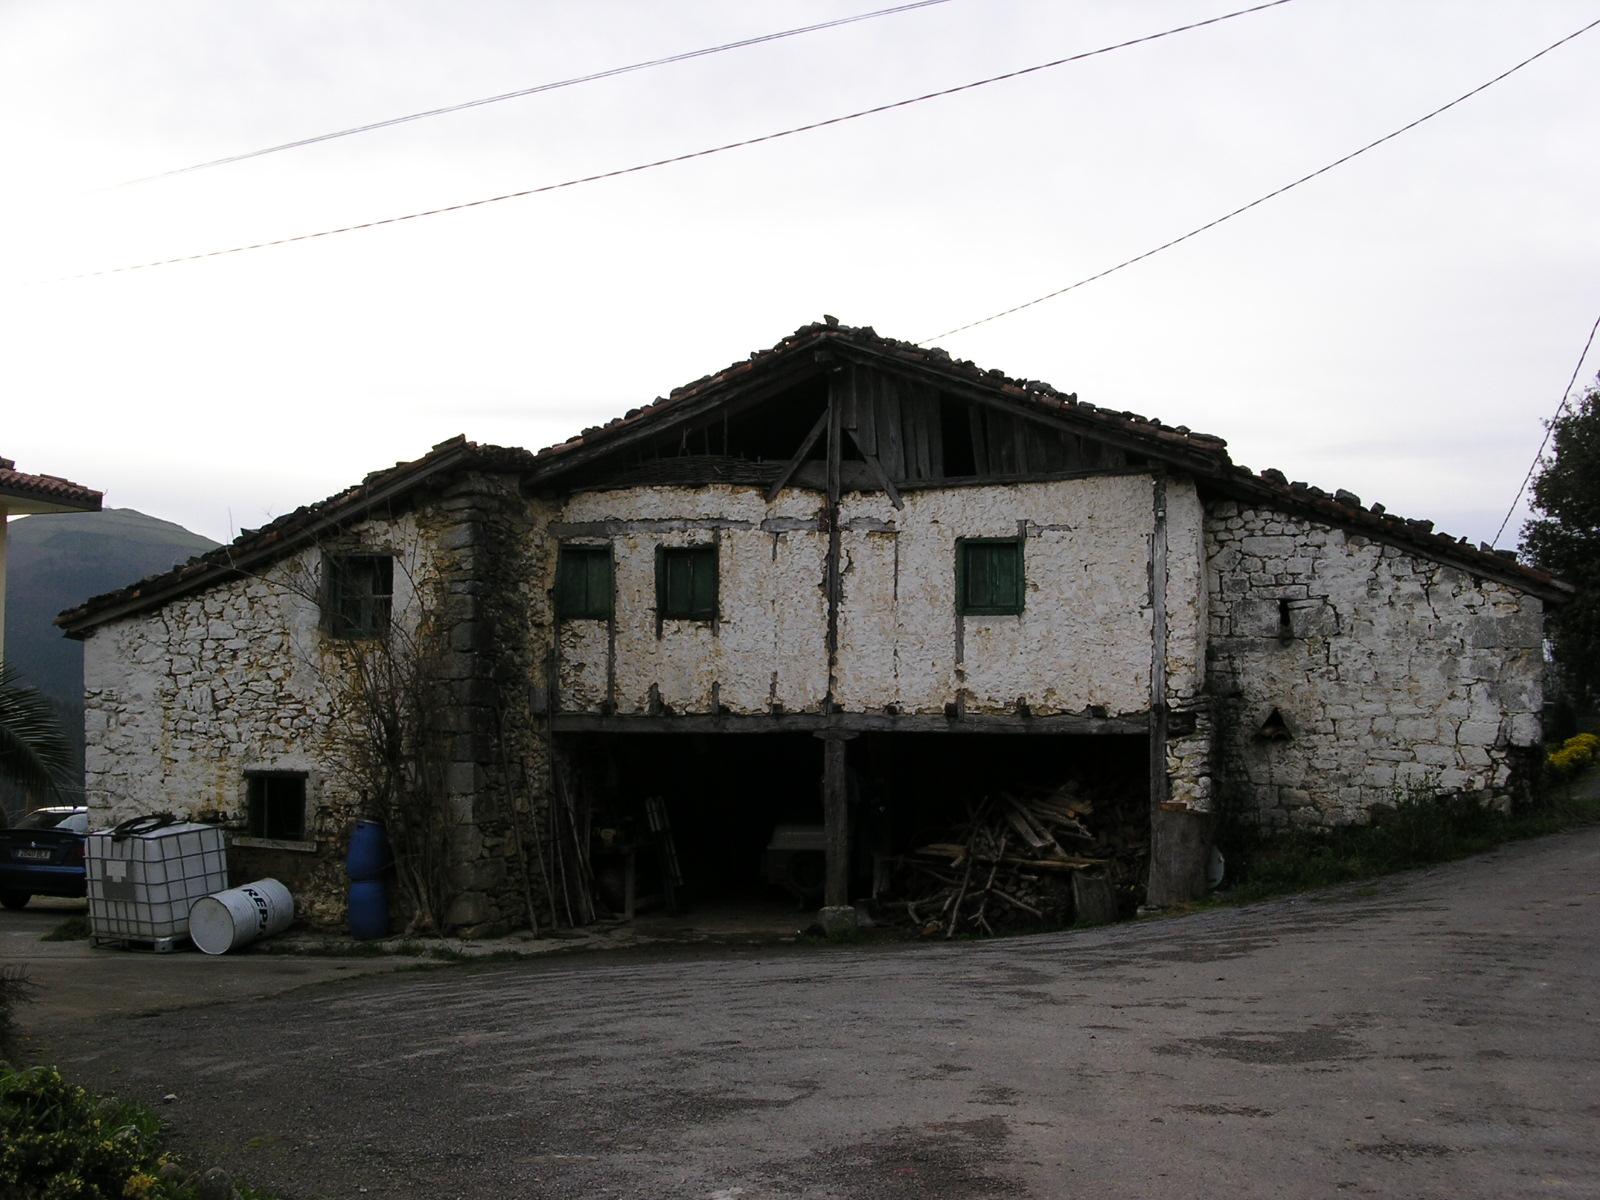 Uzar (siglo XVI)-Aulesti